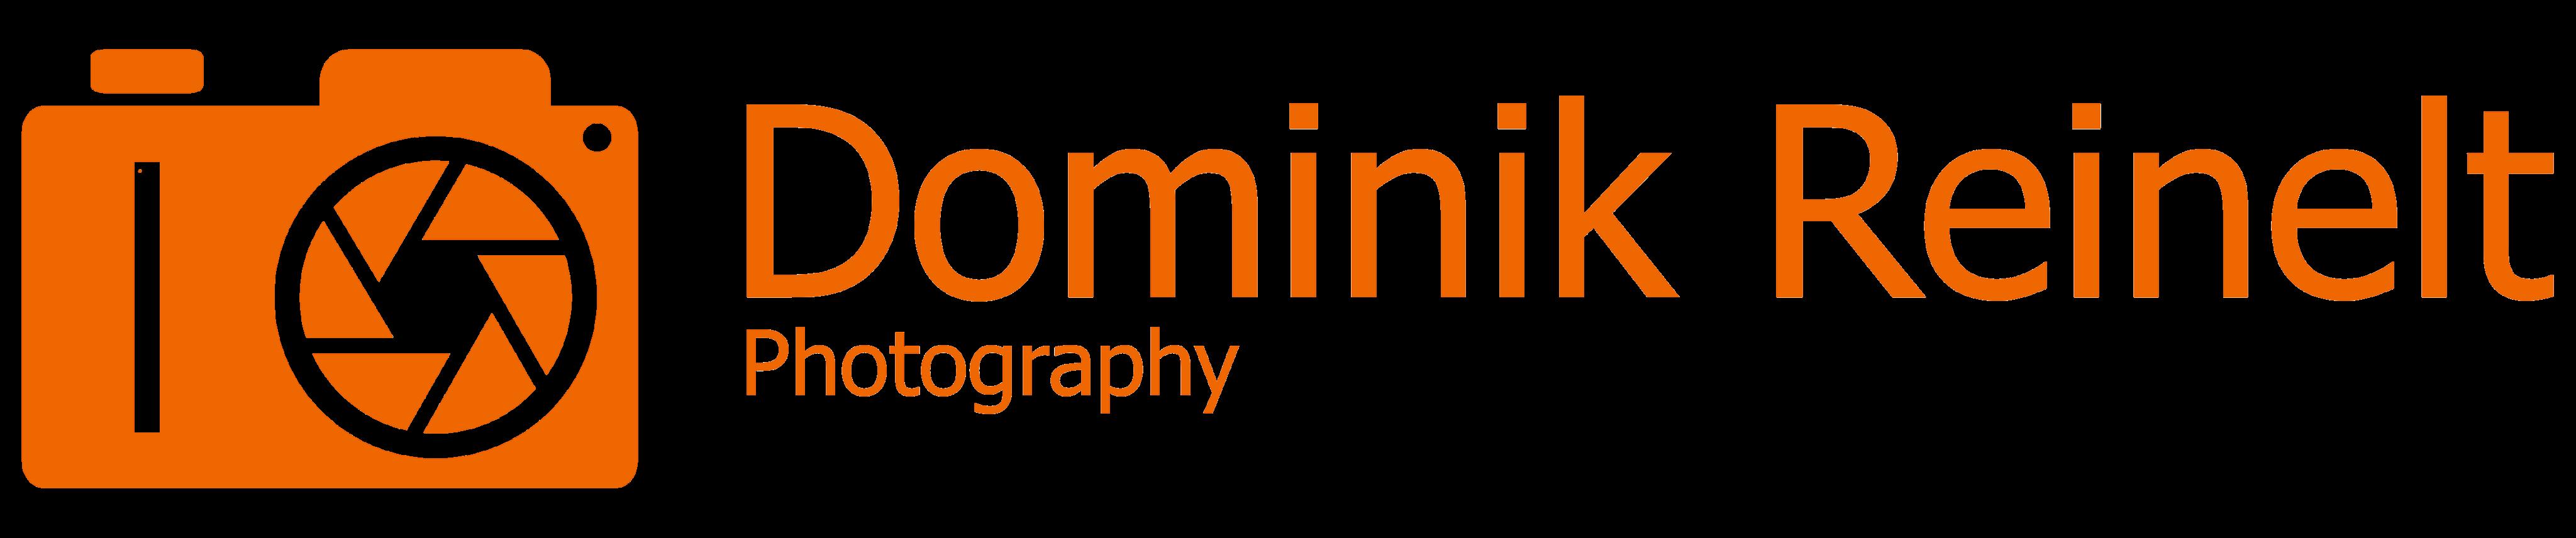 Dominik Reinelt - Photography